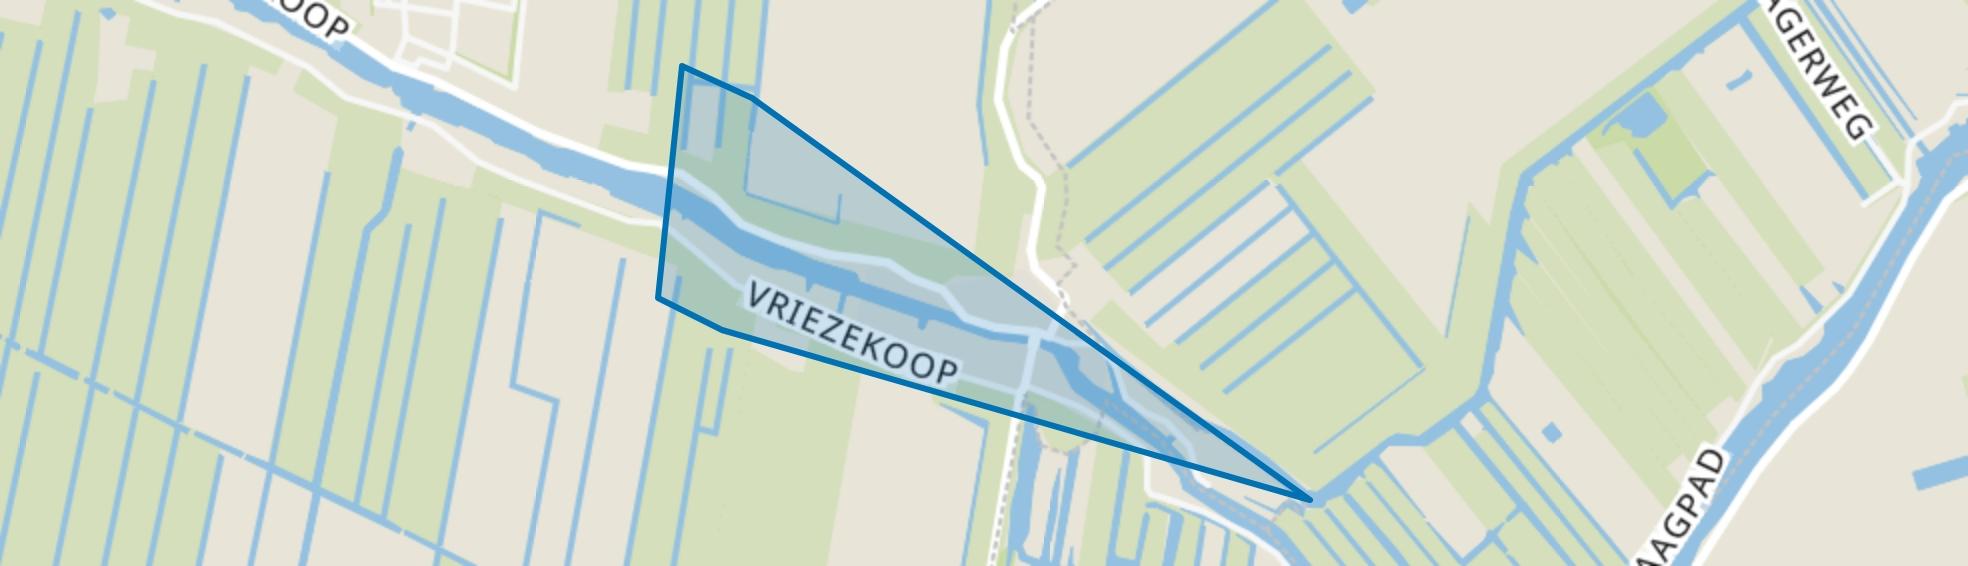 Bilderdam, Leimuiden map